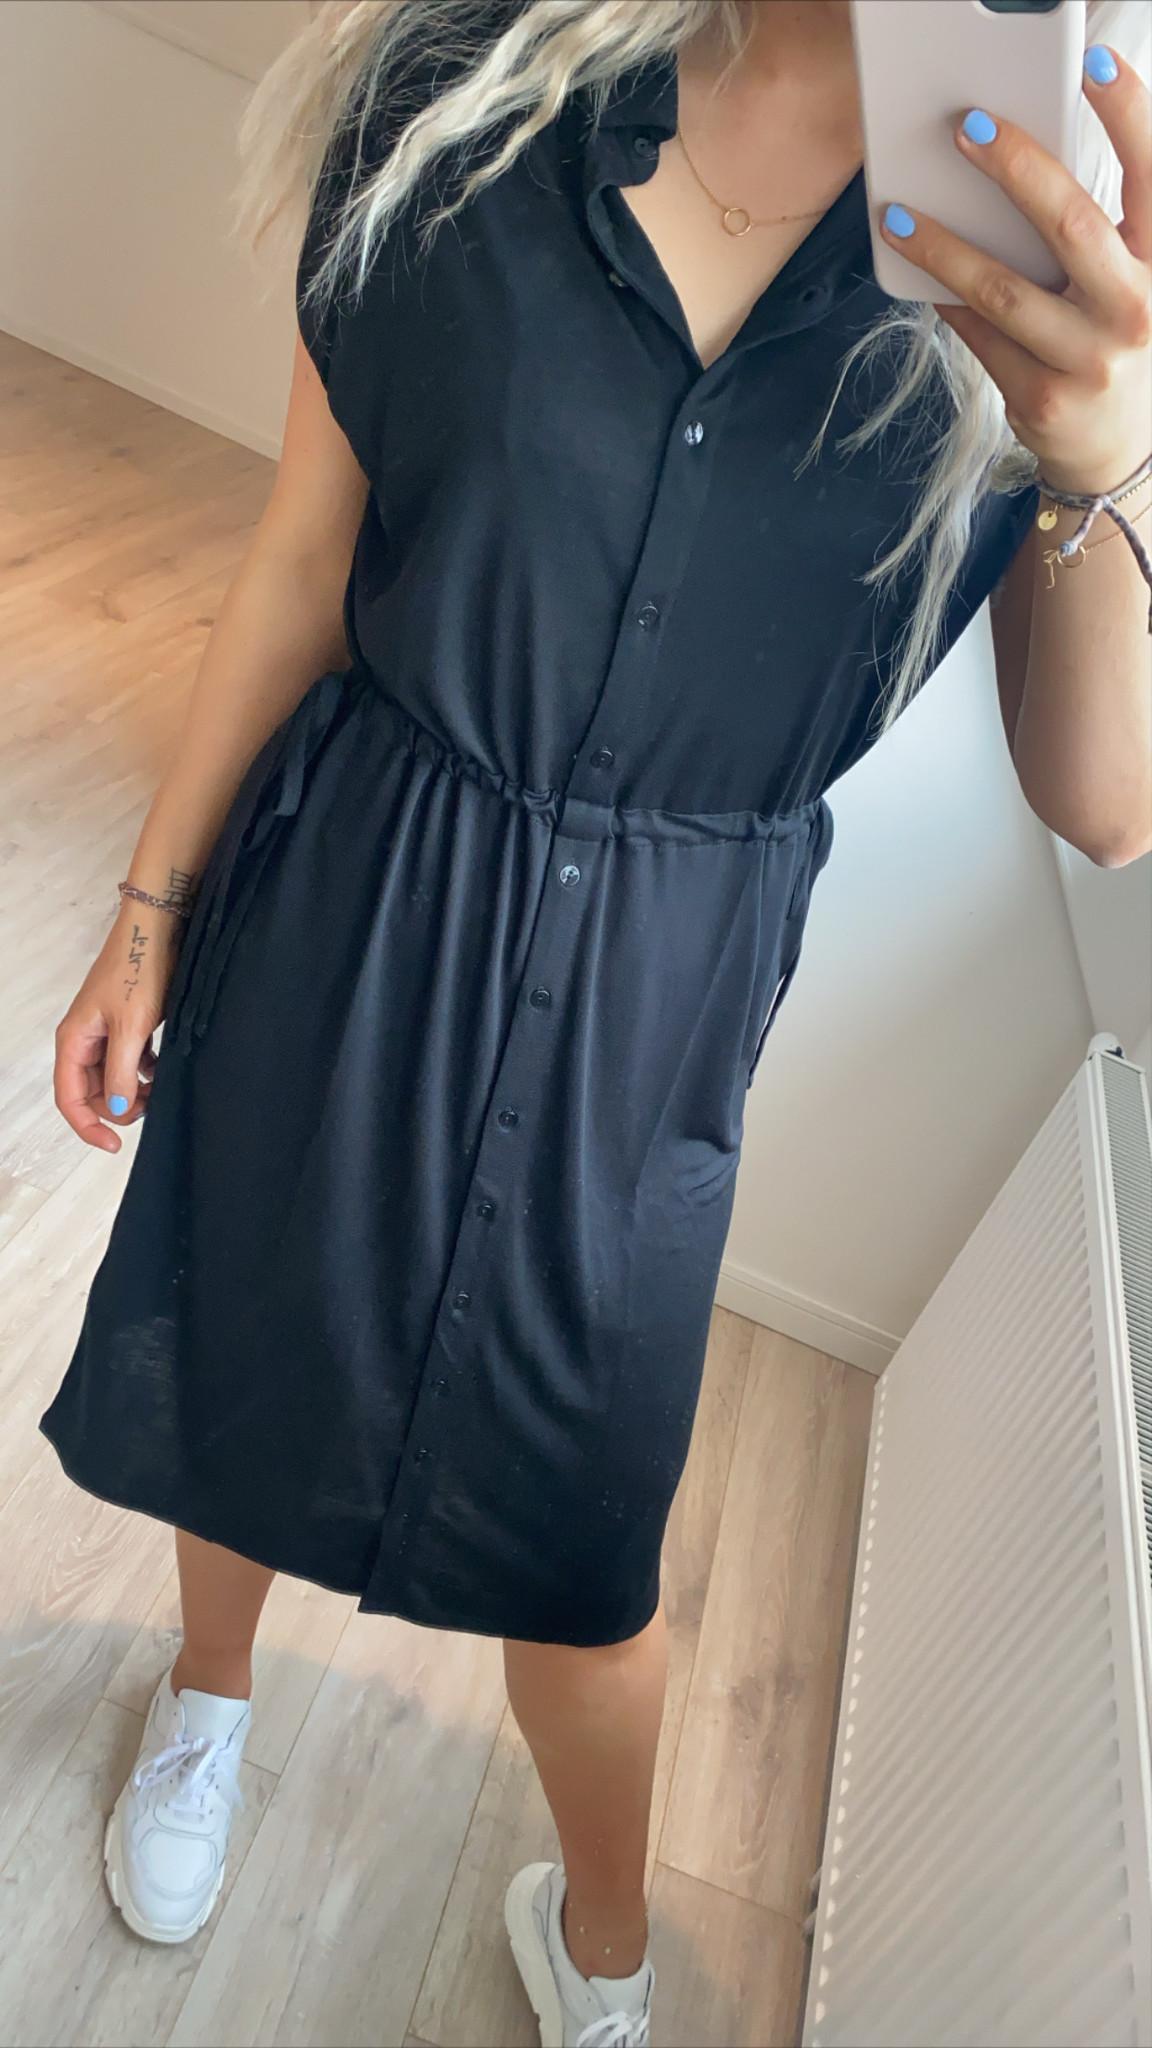 Jurk agnes dress black-7